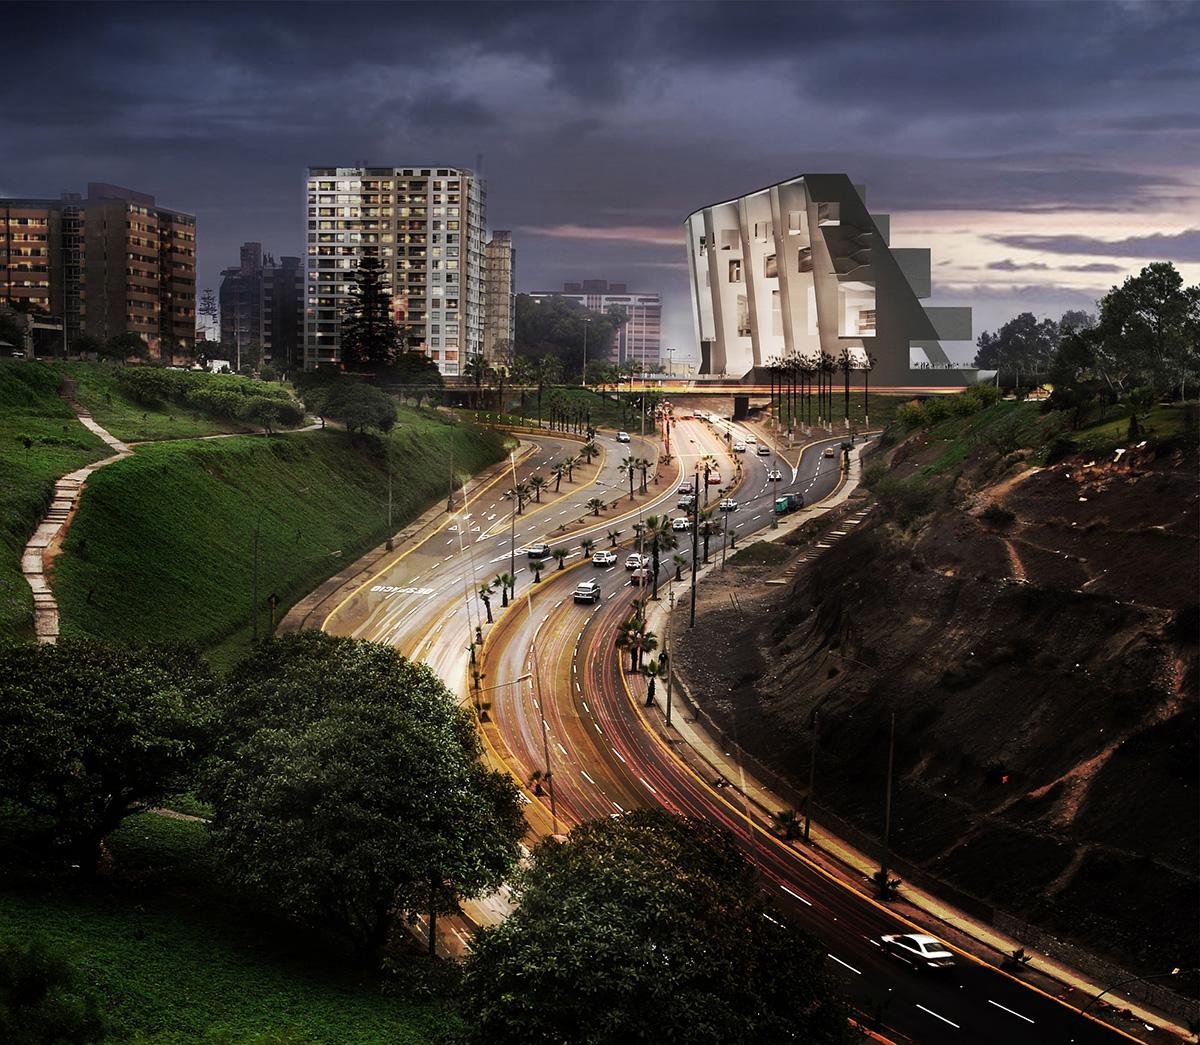 14-universidad-ingenieria-tecnologia-utec-grafton-architects-shell-arquitectos